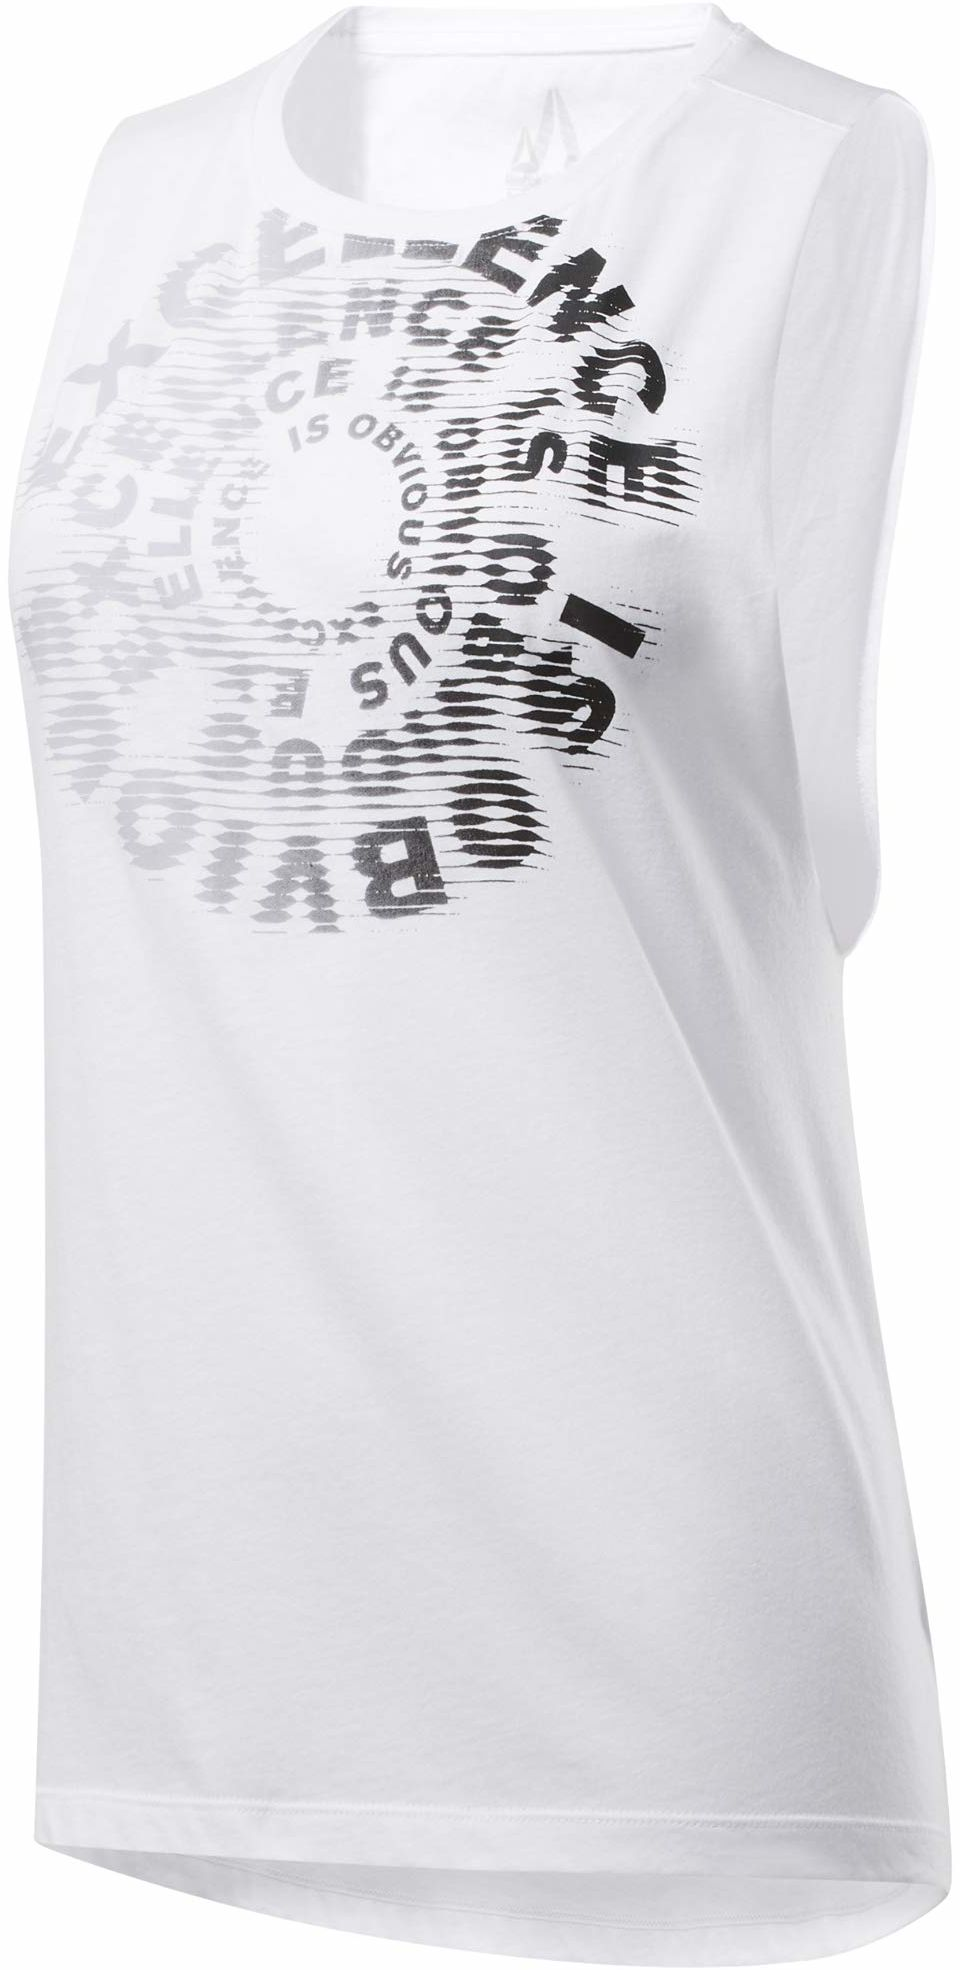 Reebok koszulka damska Cf Excellence is Obvious Muscle Tank bez rękawów biały L